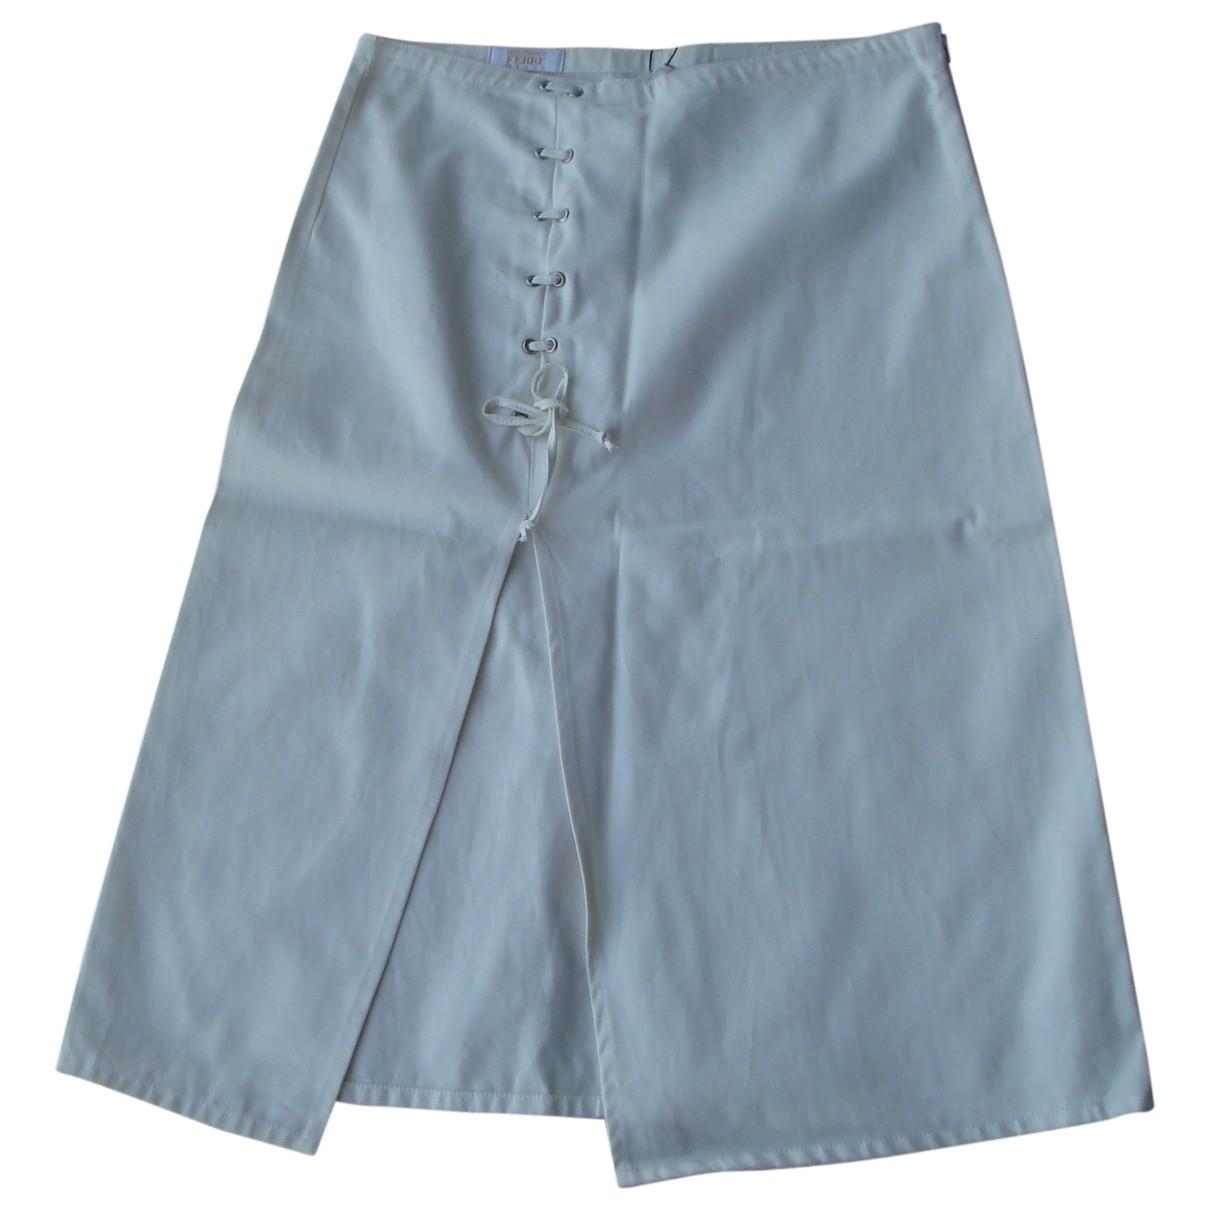 Gianfranco Ferré \N Ecru Cotton skirt for Women 42 IT